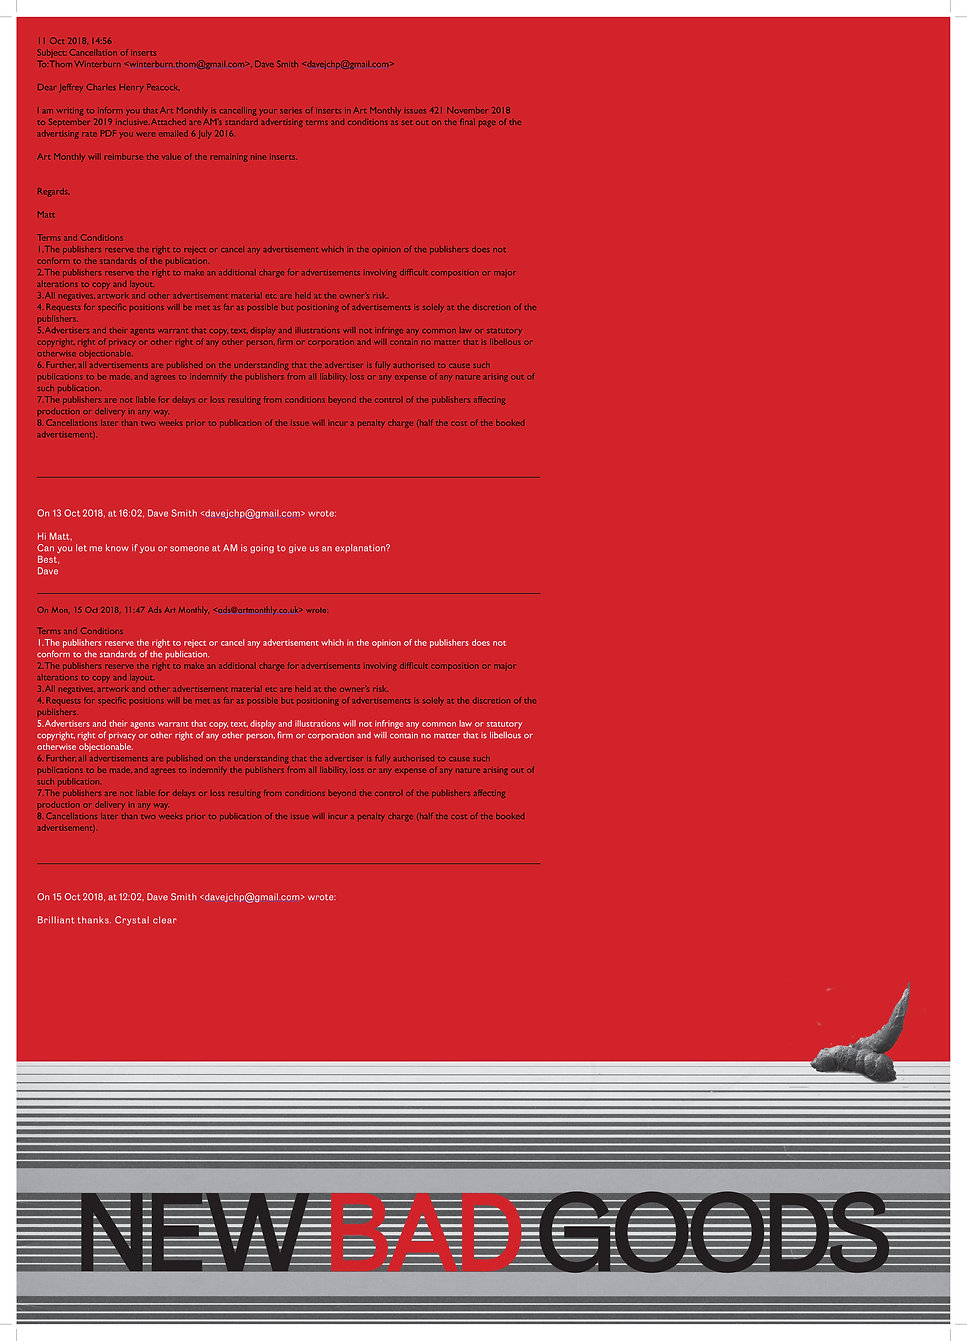 cancelledNEWBADGOODS-1 copy.jpg